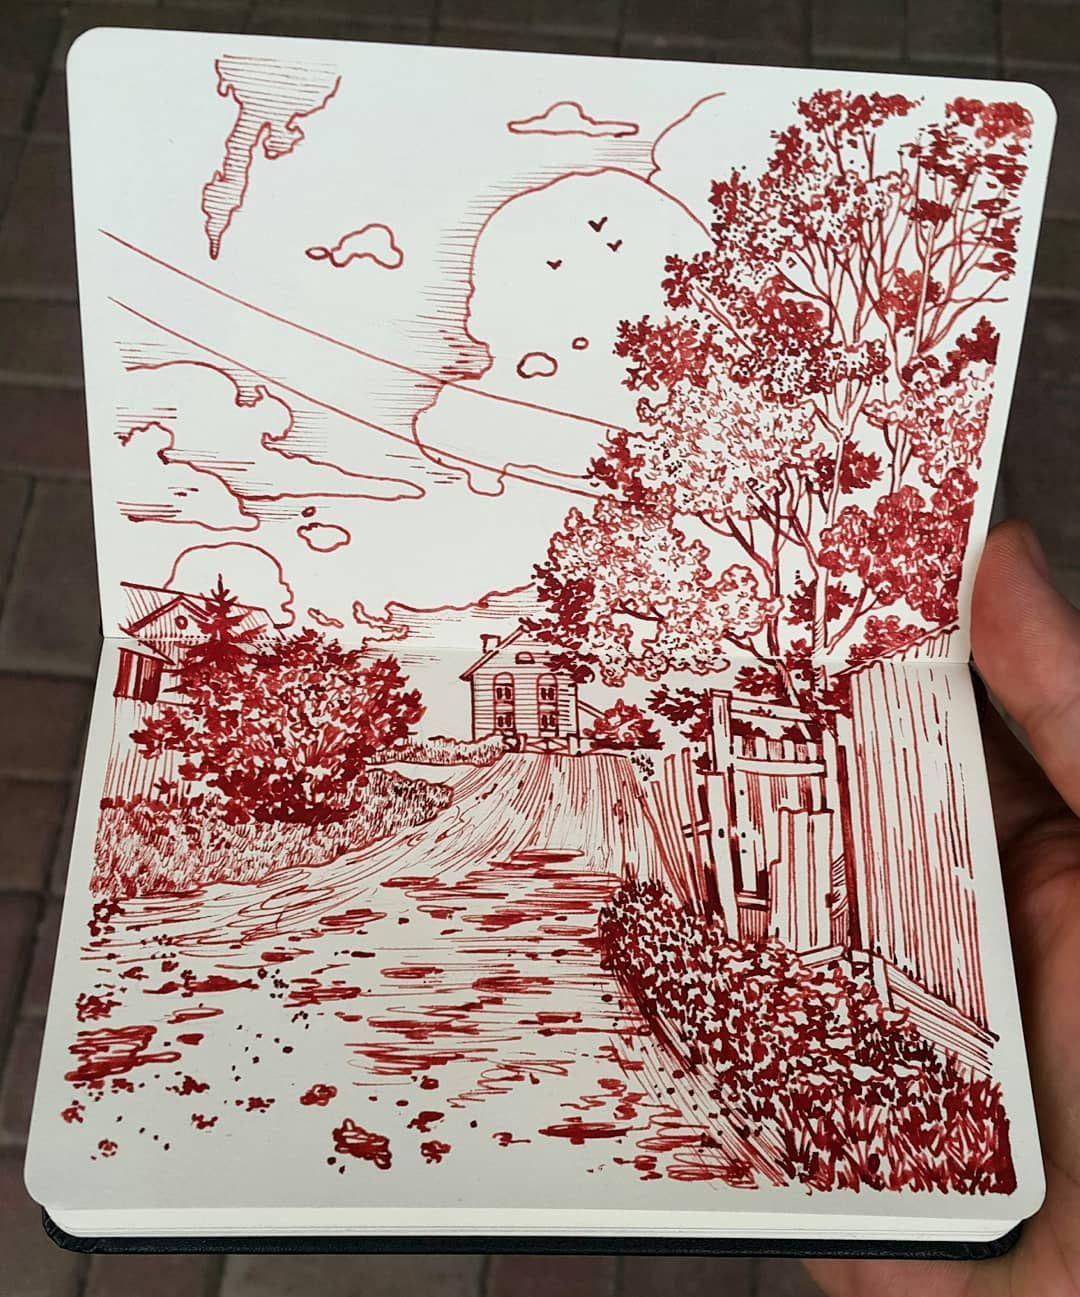 Dorozhka Vverh Path To The Top Evening Sketch Moleskine Twsb